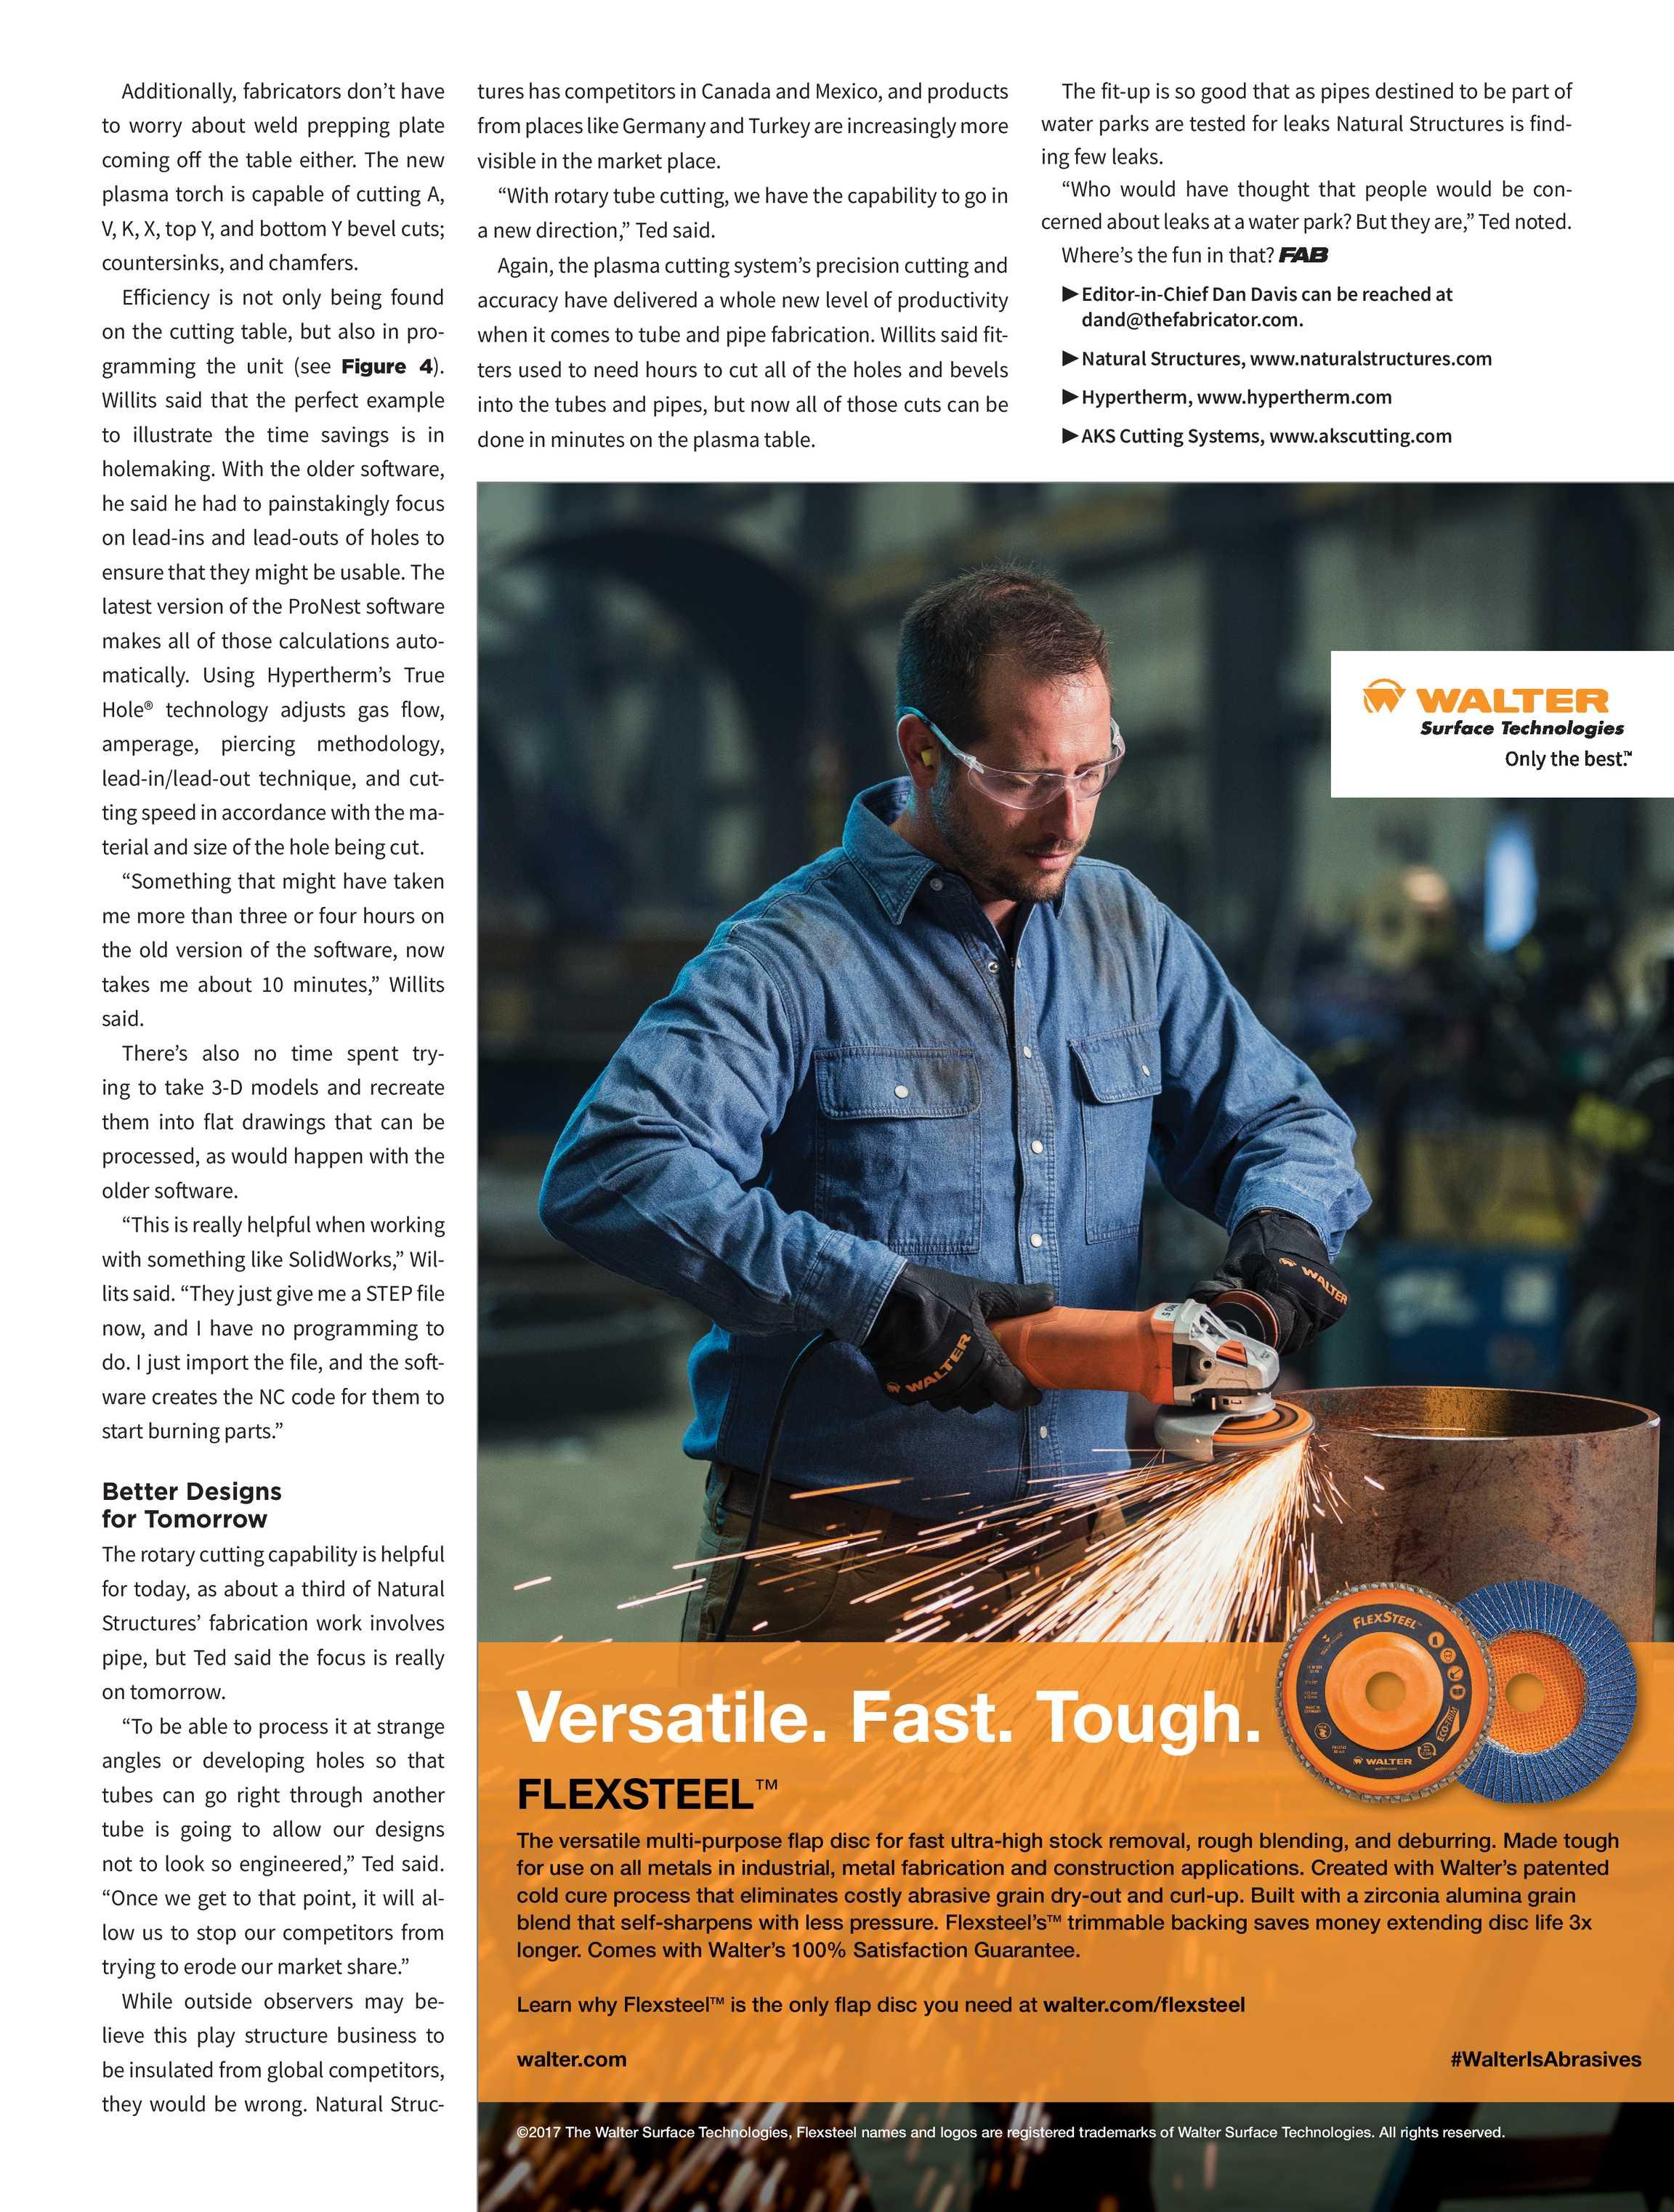 The Fabricator - April 2018 - page 82